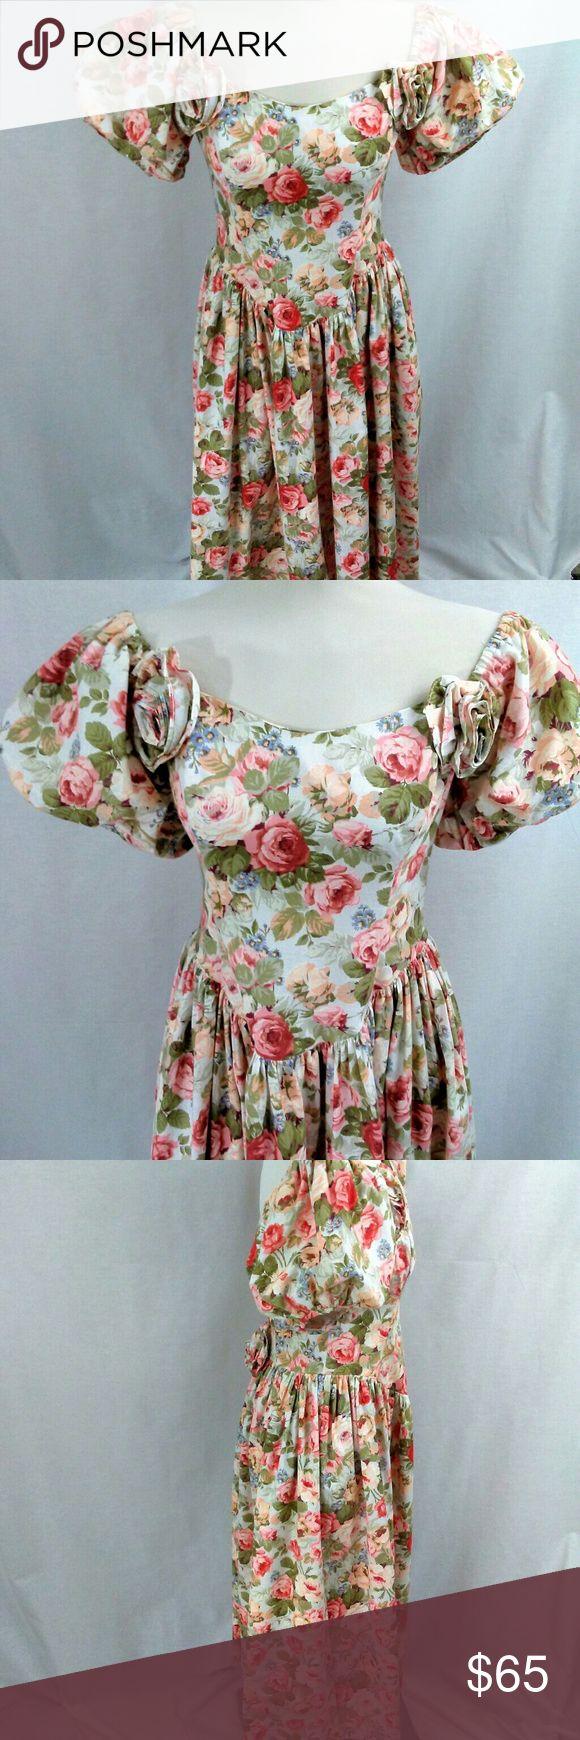 "Vintage Jessica McClintock Floral Dress Stunning floral Dress by Jessica McClintock. Sleeves can be worn on the shoulders or off. The fairy tale designer. Measurements: armpit to armpit 19"", waist 30"", top of bodice to hem 42"" Jessica McClintock Dresses"